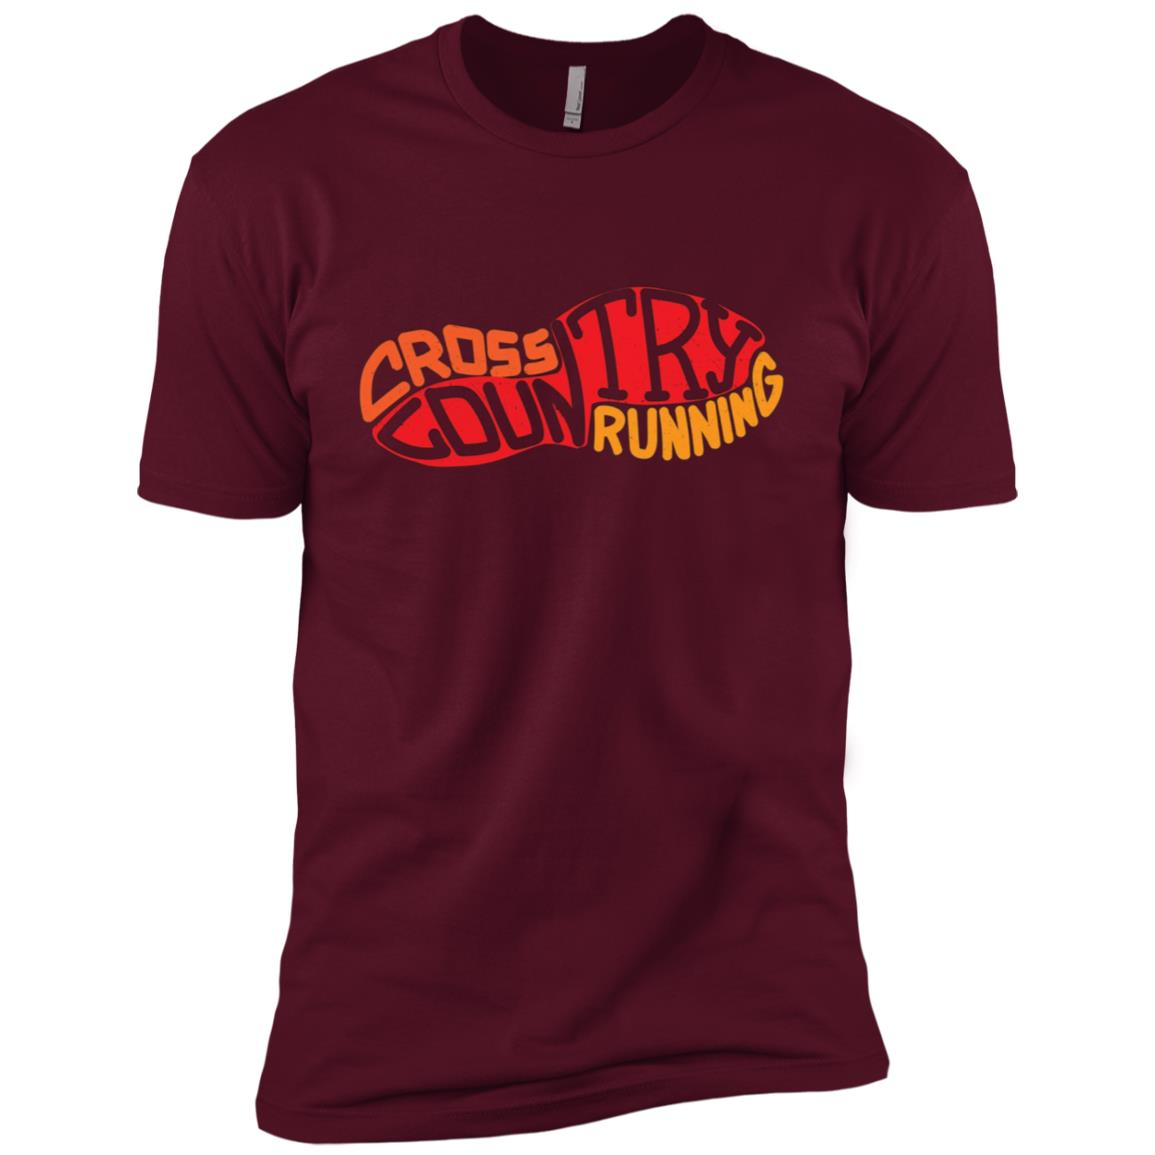 XC Runner Cross Country Runners Training Men Short Sleeve T-Shirt